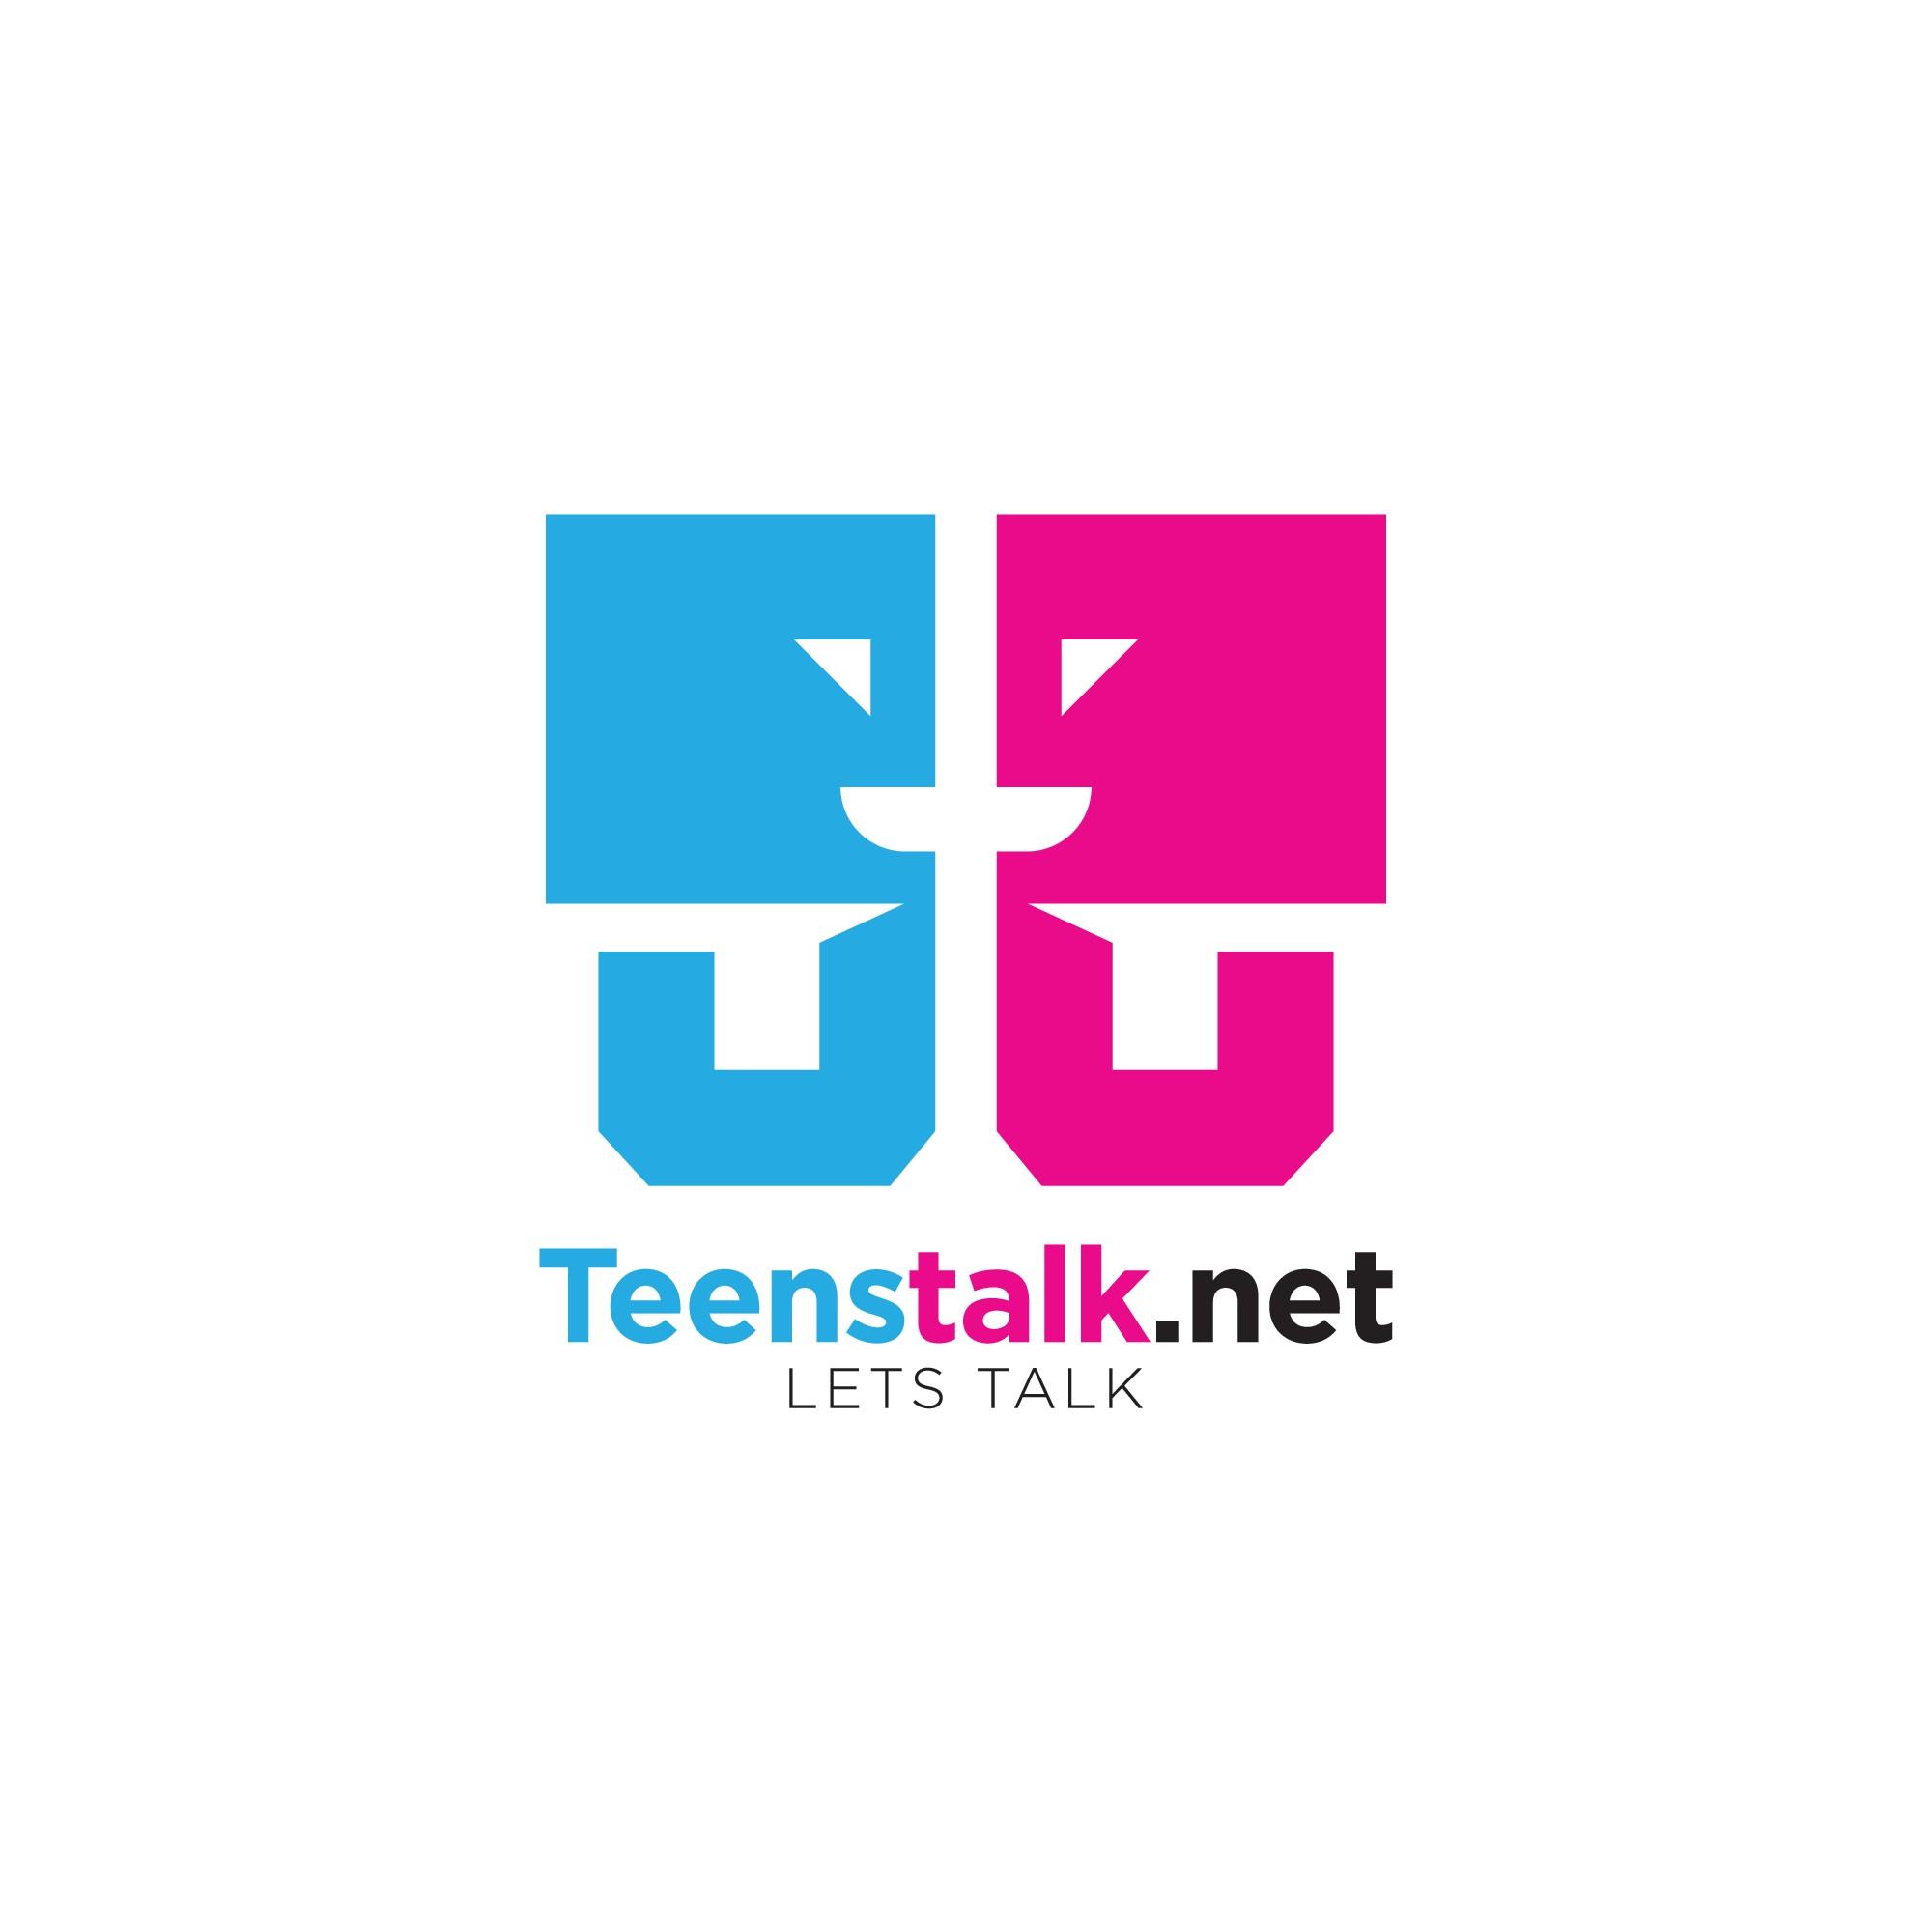 the teenstalk logo contest